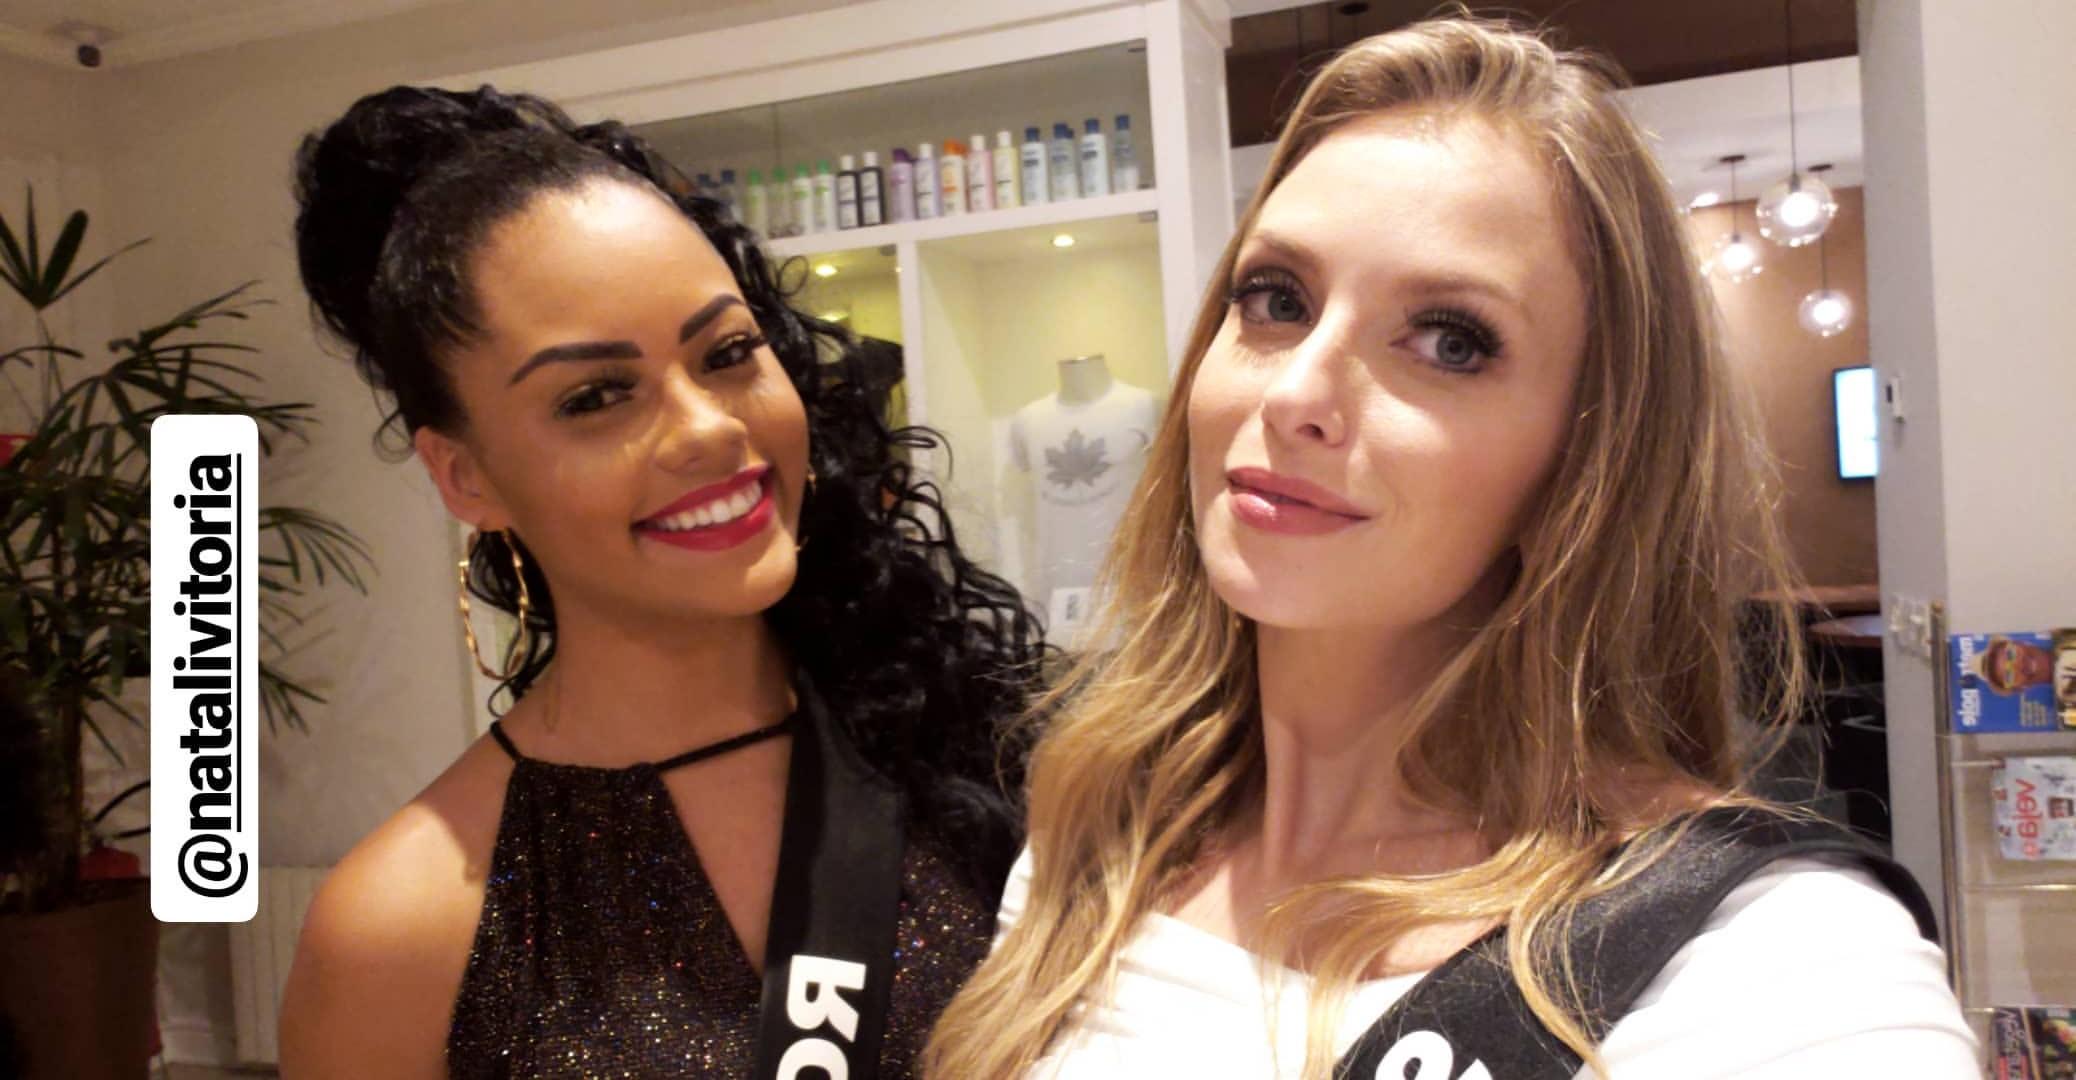 natali vitoria, top 15 de miss brasil universo 2019 /miss brasil teen universe 2017. primeira miss negra a vencer o miss roraima. - Página 11 52616110